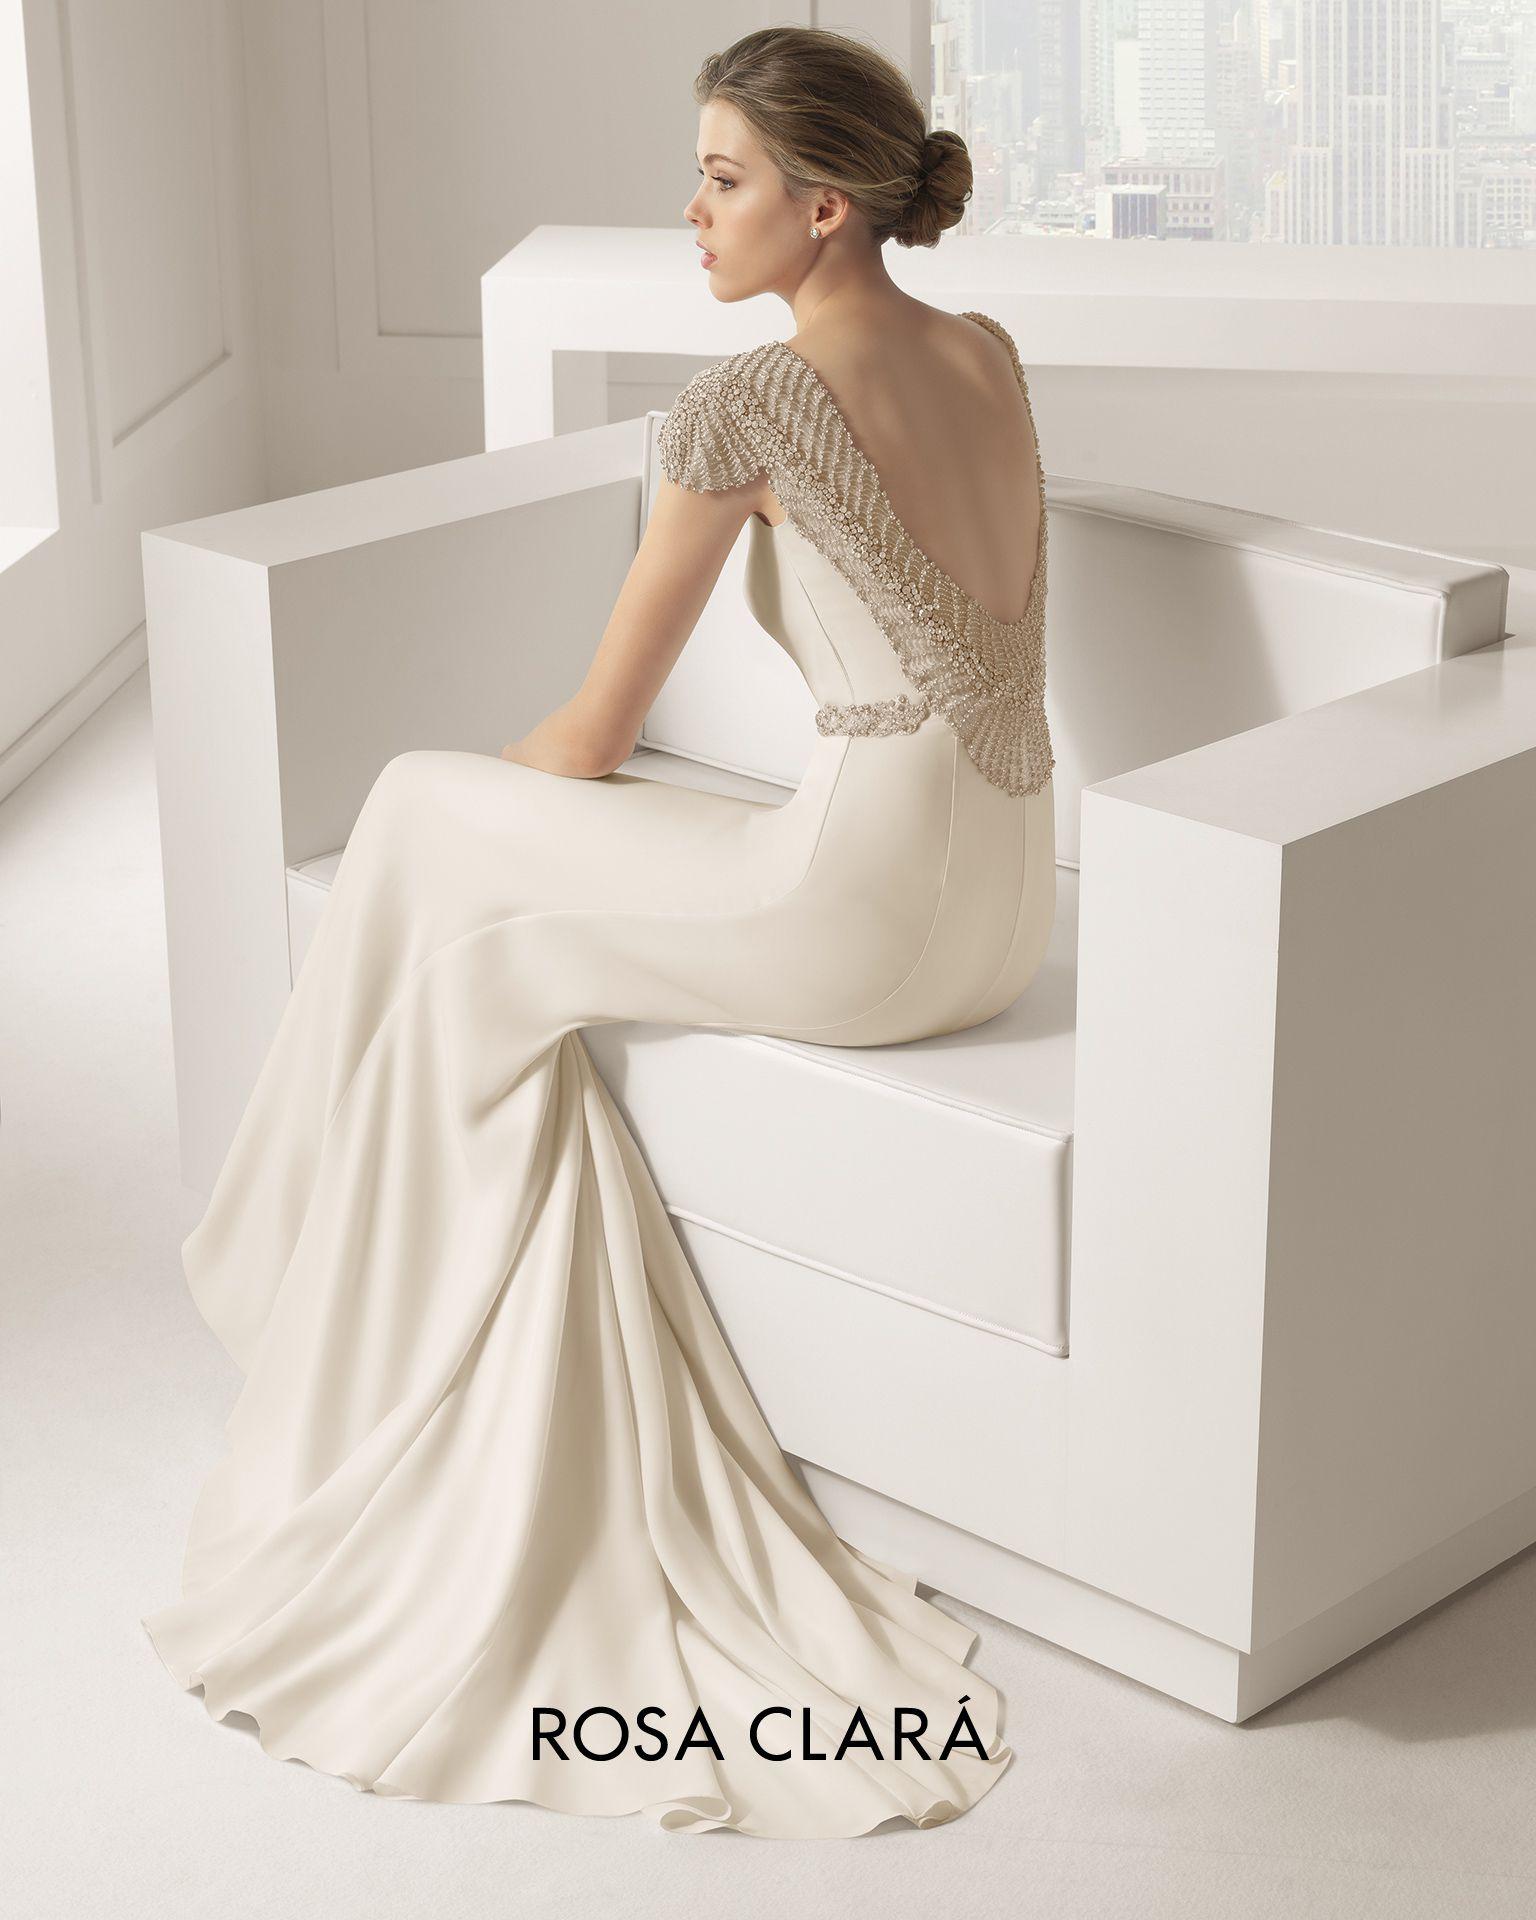 Rosa Clara Kolekce 2015 Spanish Fashion Info